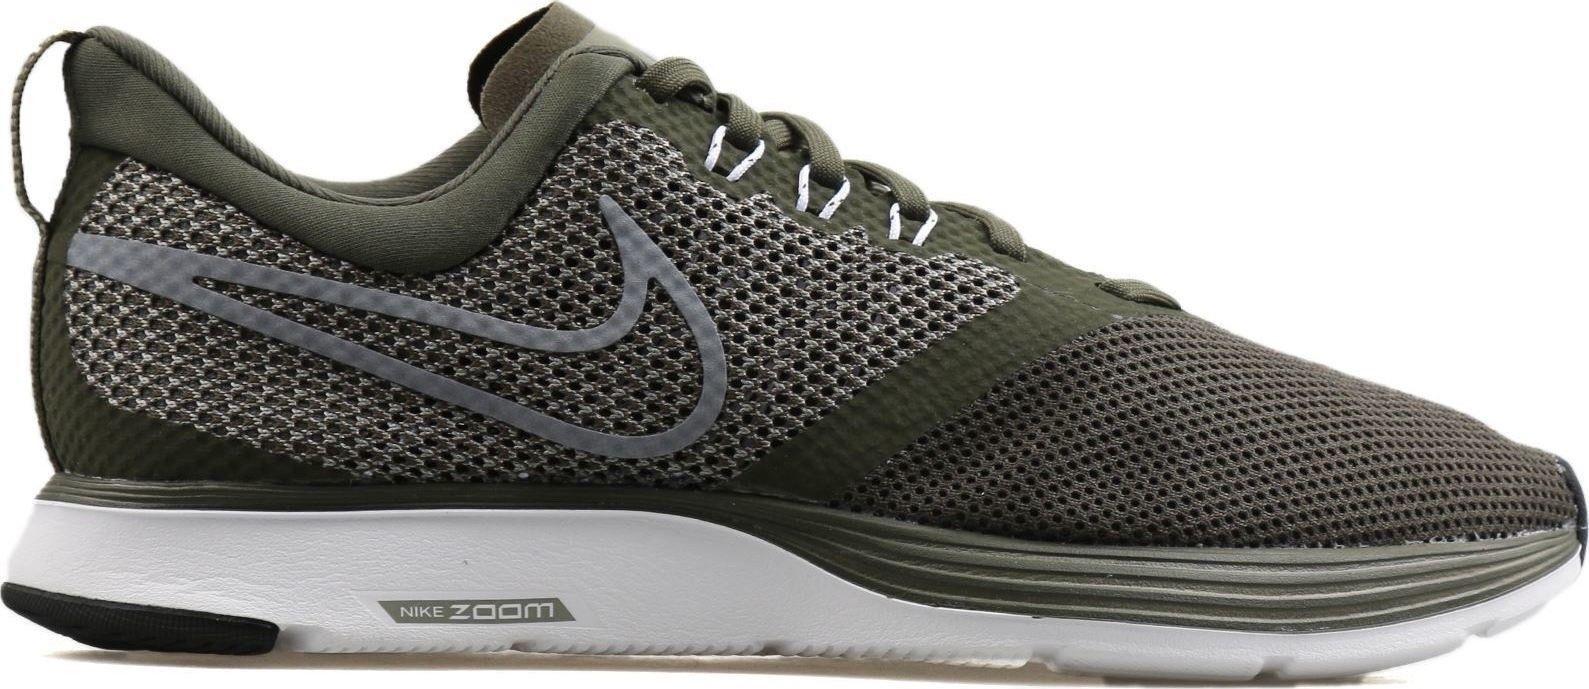 Nike comodas Zoom zapatillas comodas Nike casual hombres huelga salvaje 98dcc0